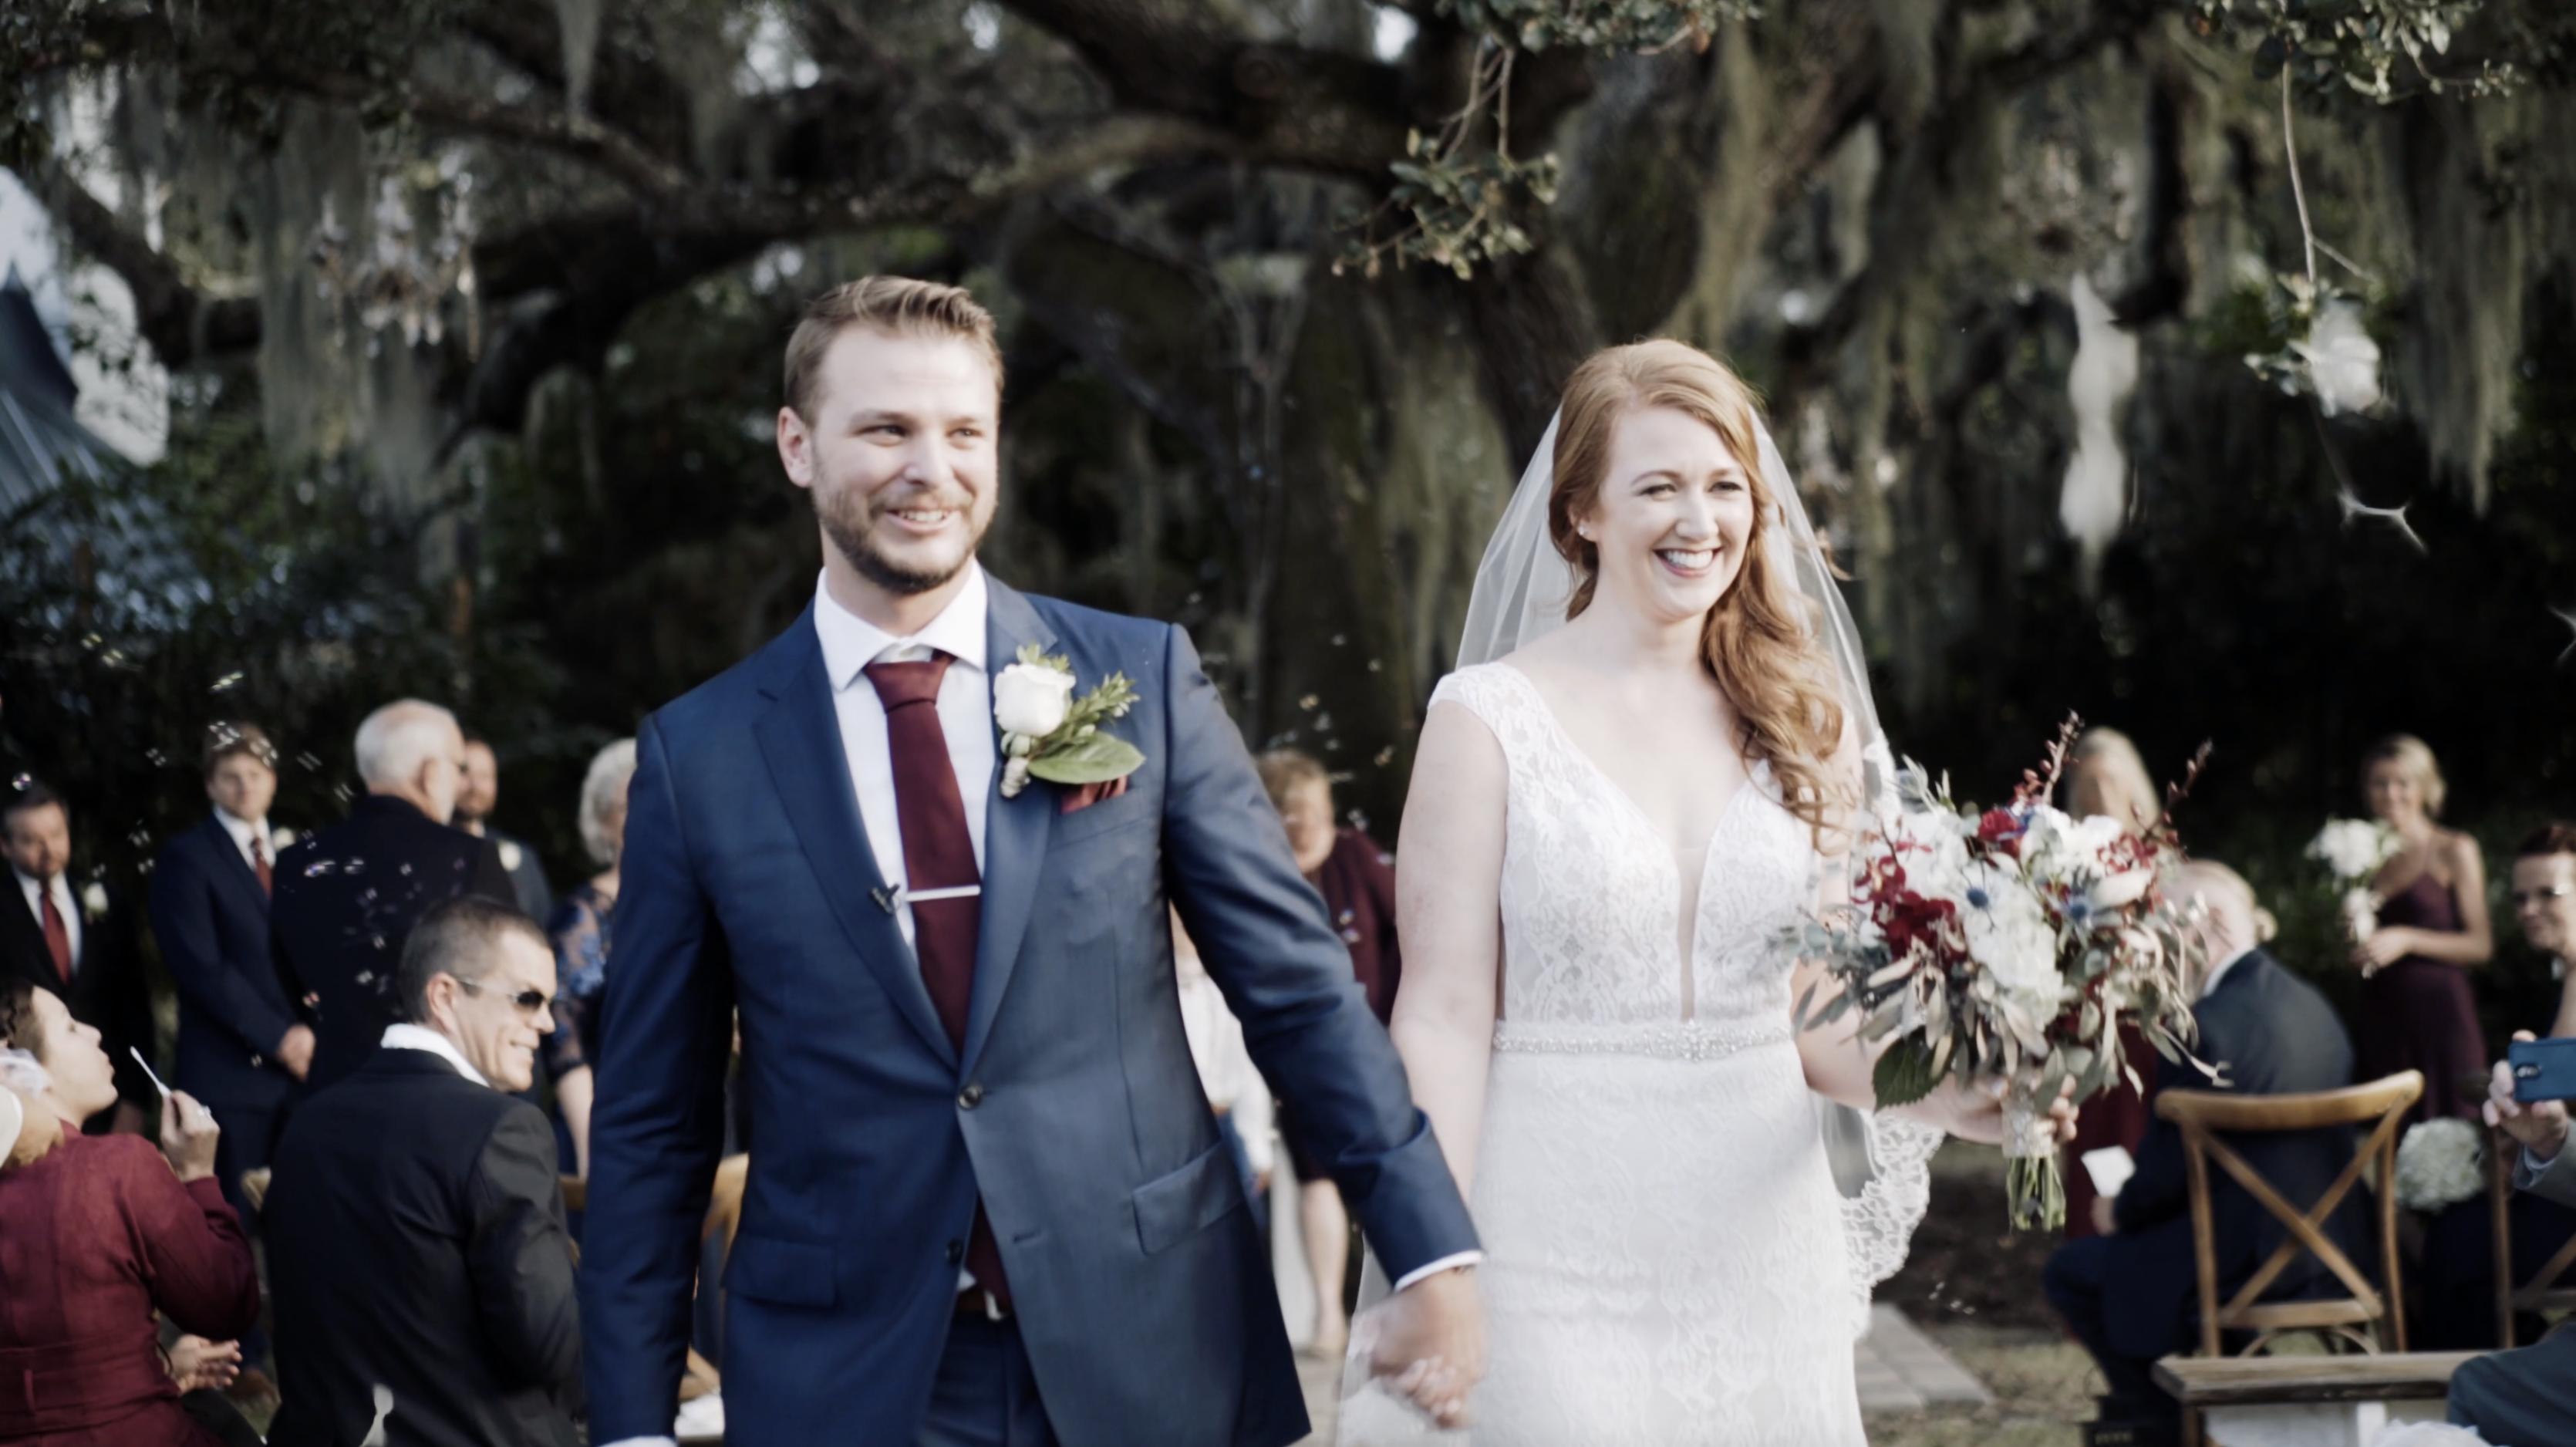 Melissa + Scott | Fort Pierce, Florida | The Lake House